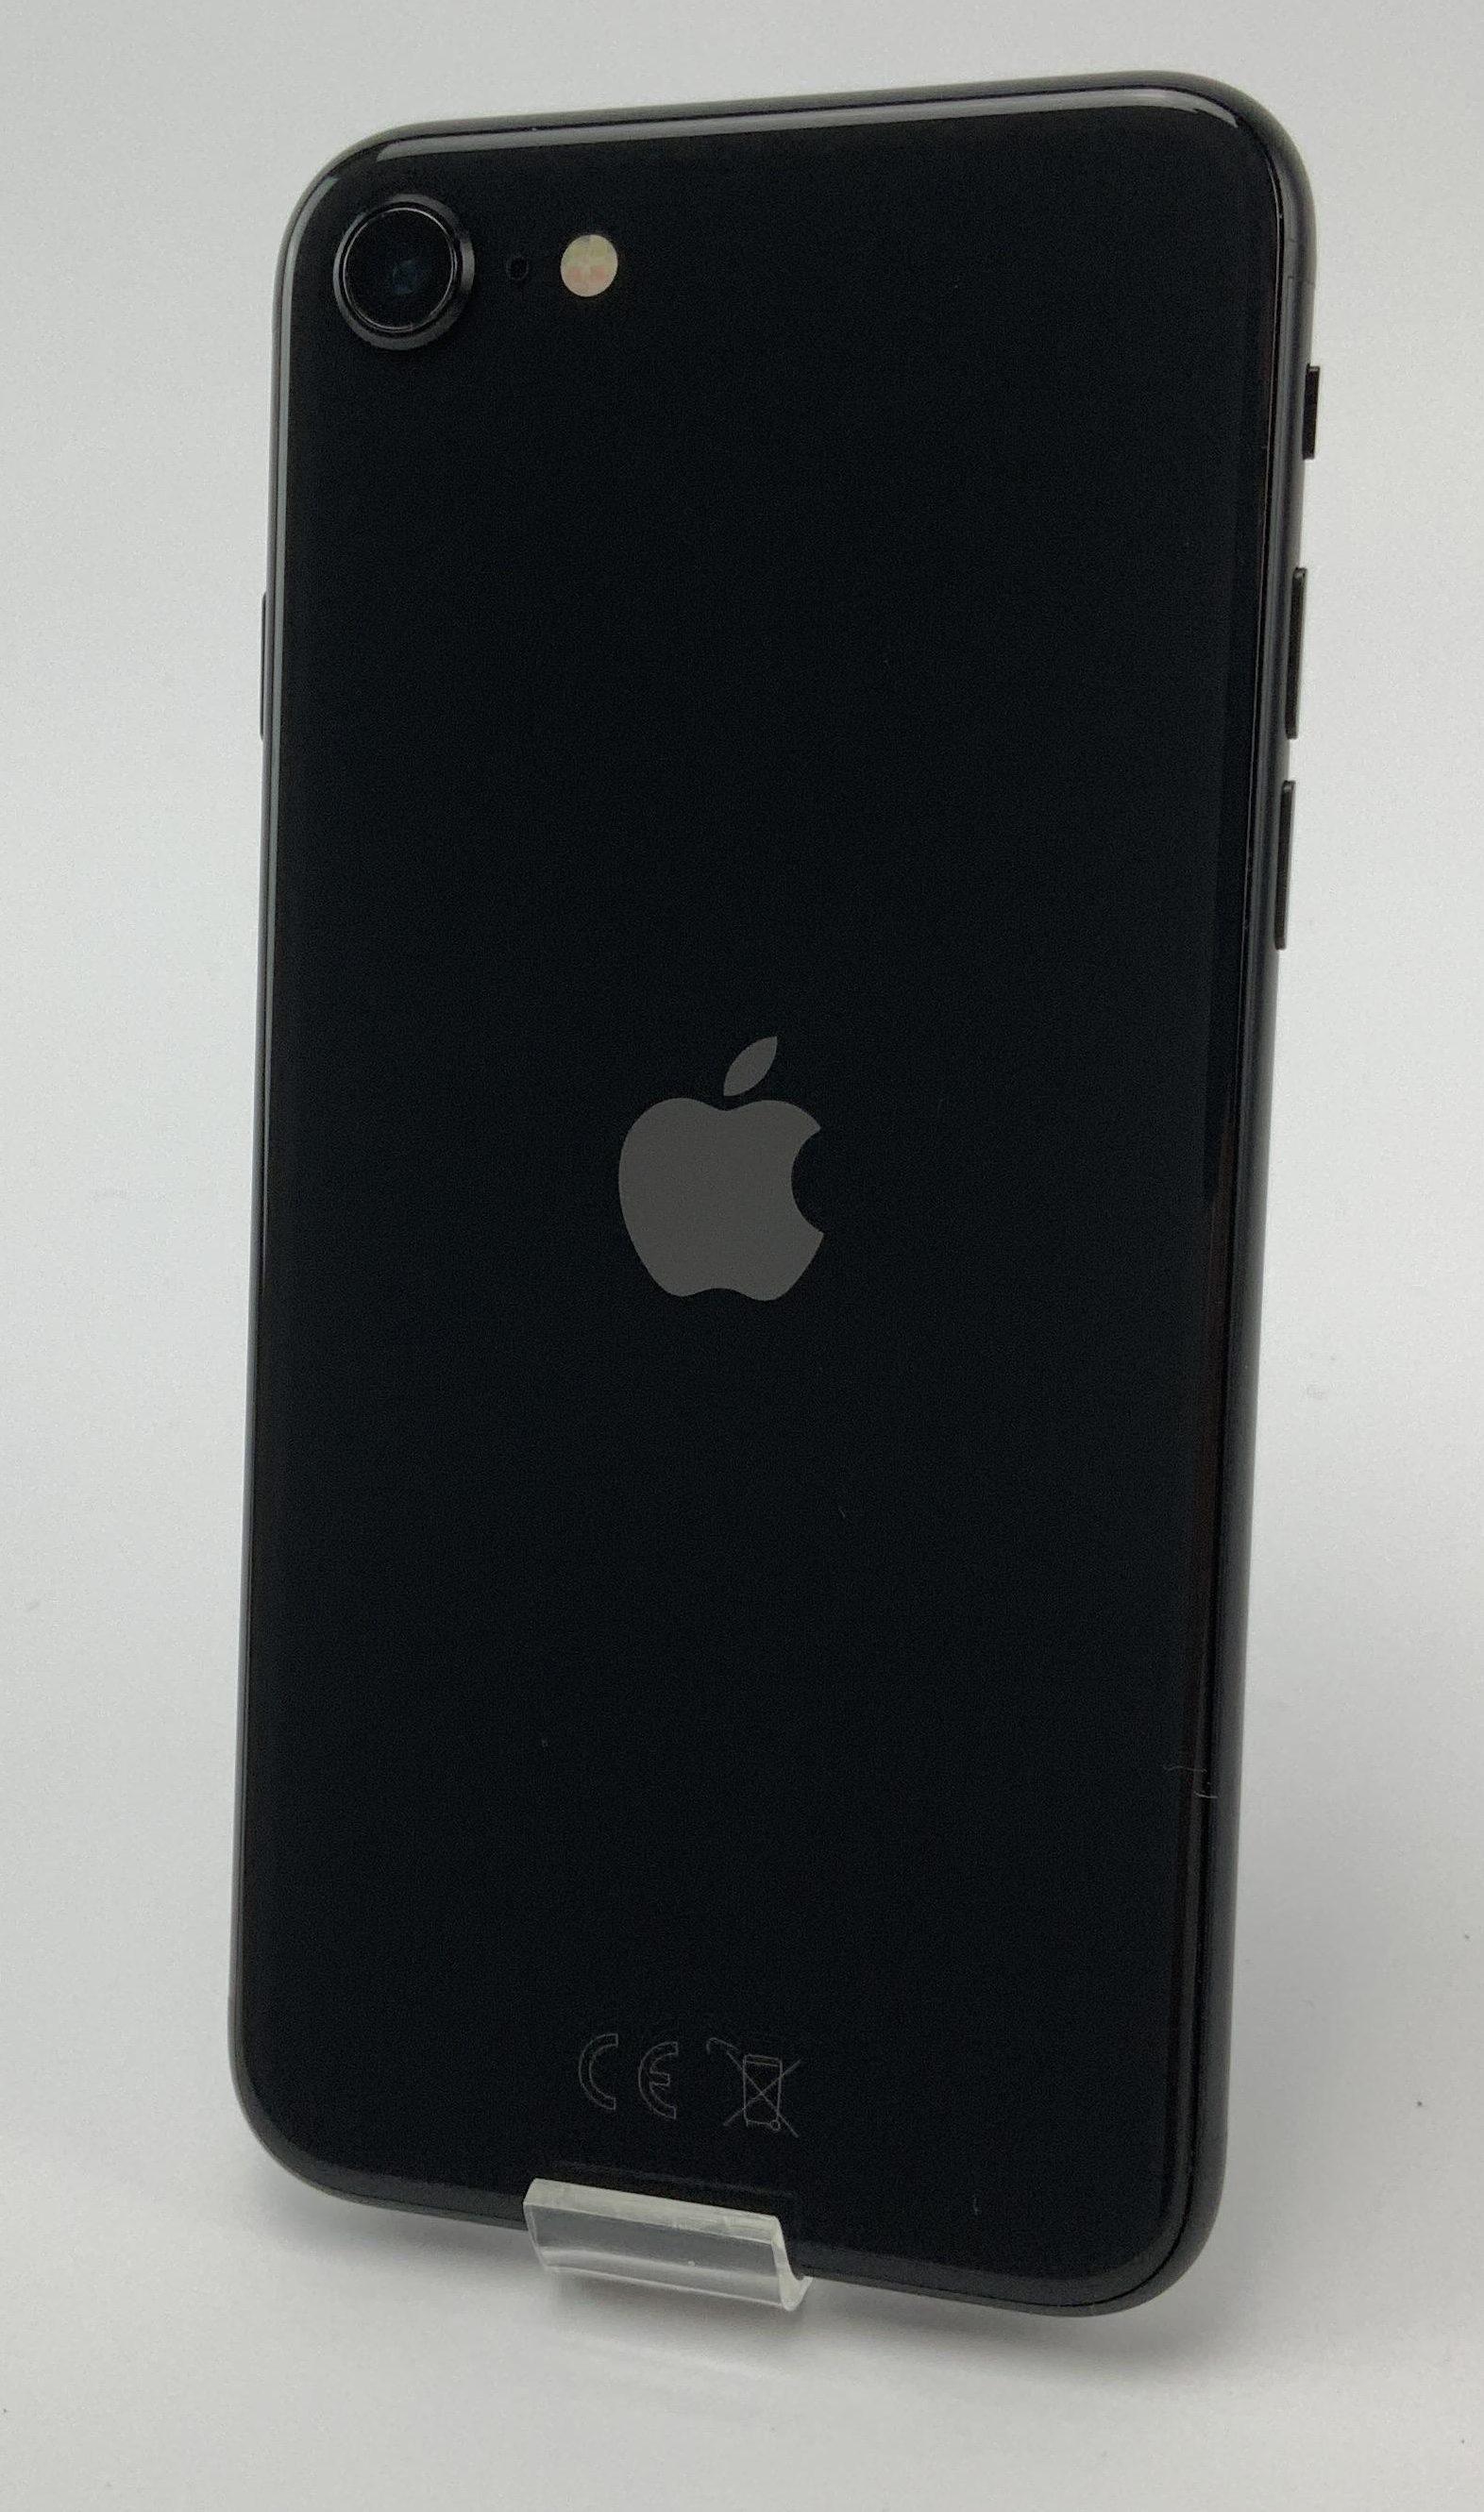 iPhone SE (2nd Gen) 64GB, 64GB, Black, bild 2